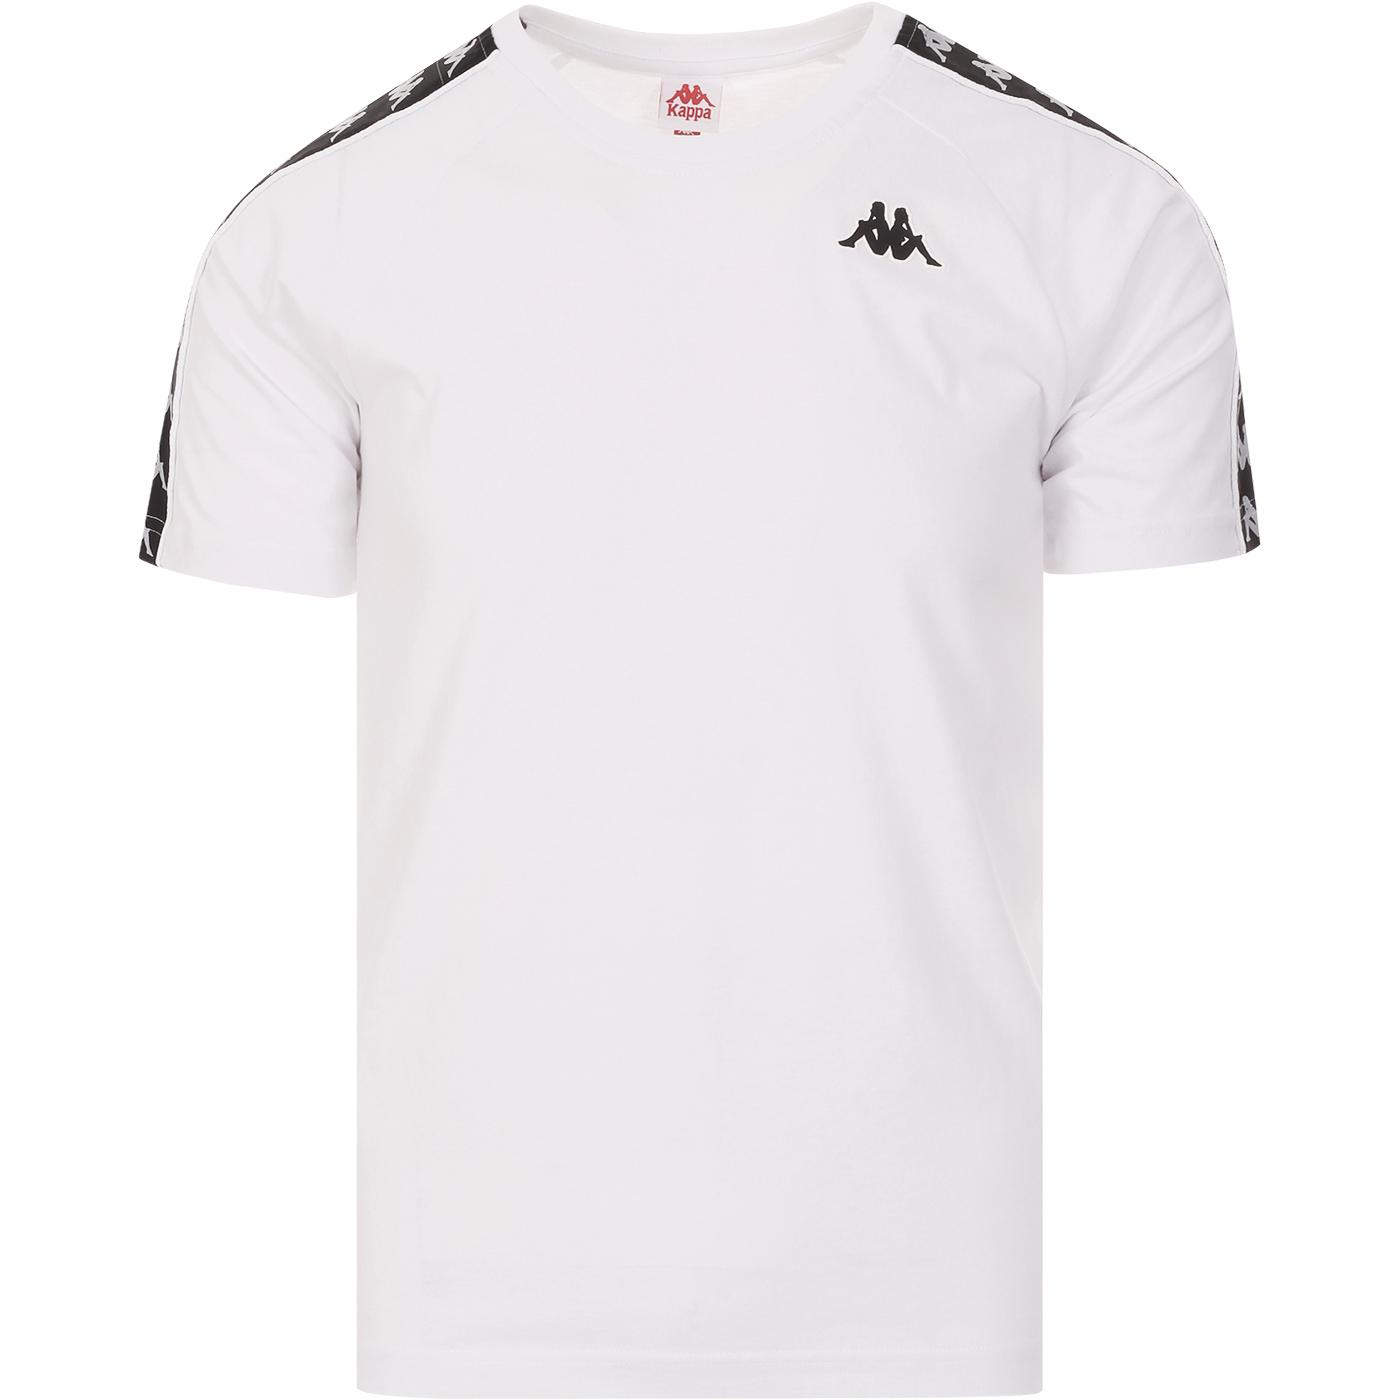 Coen KAPPA Retro 80s Taped Sleeve T-Shirt (W/B)